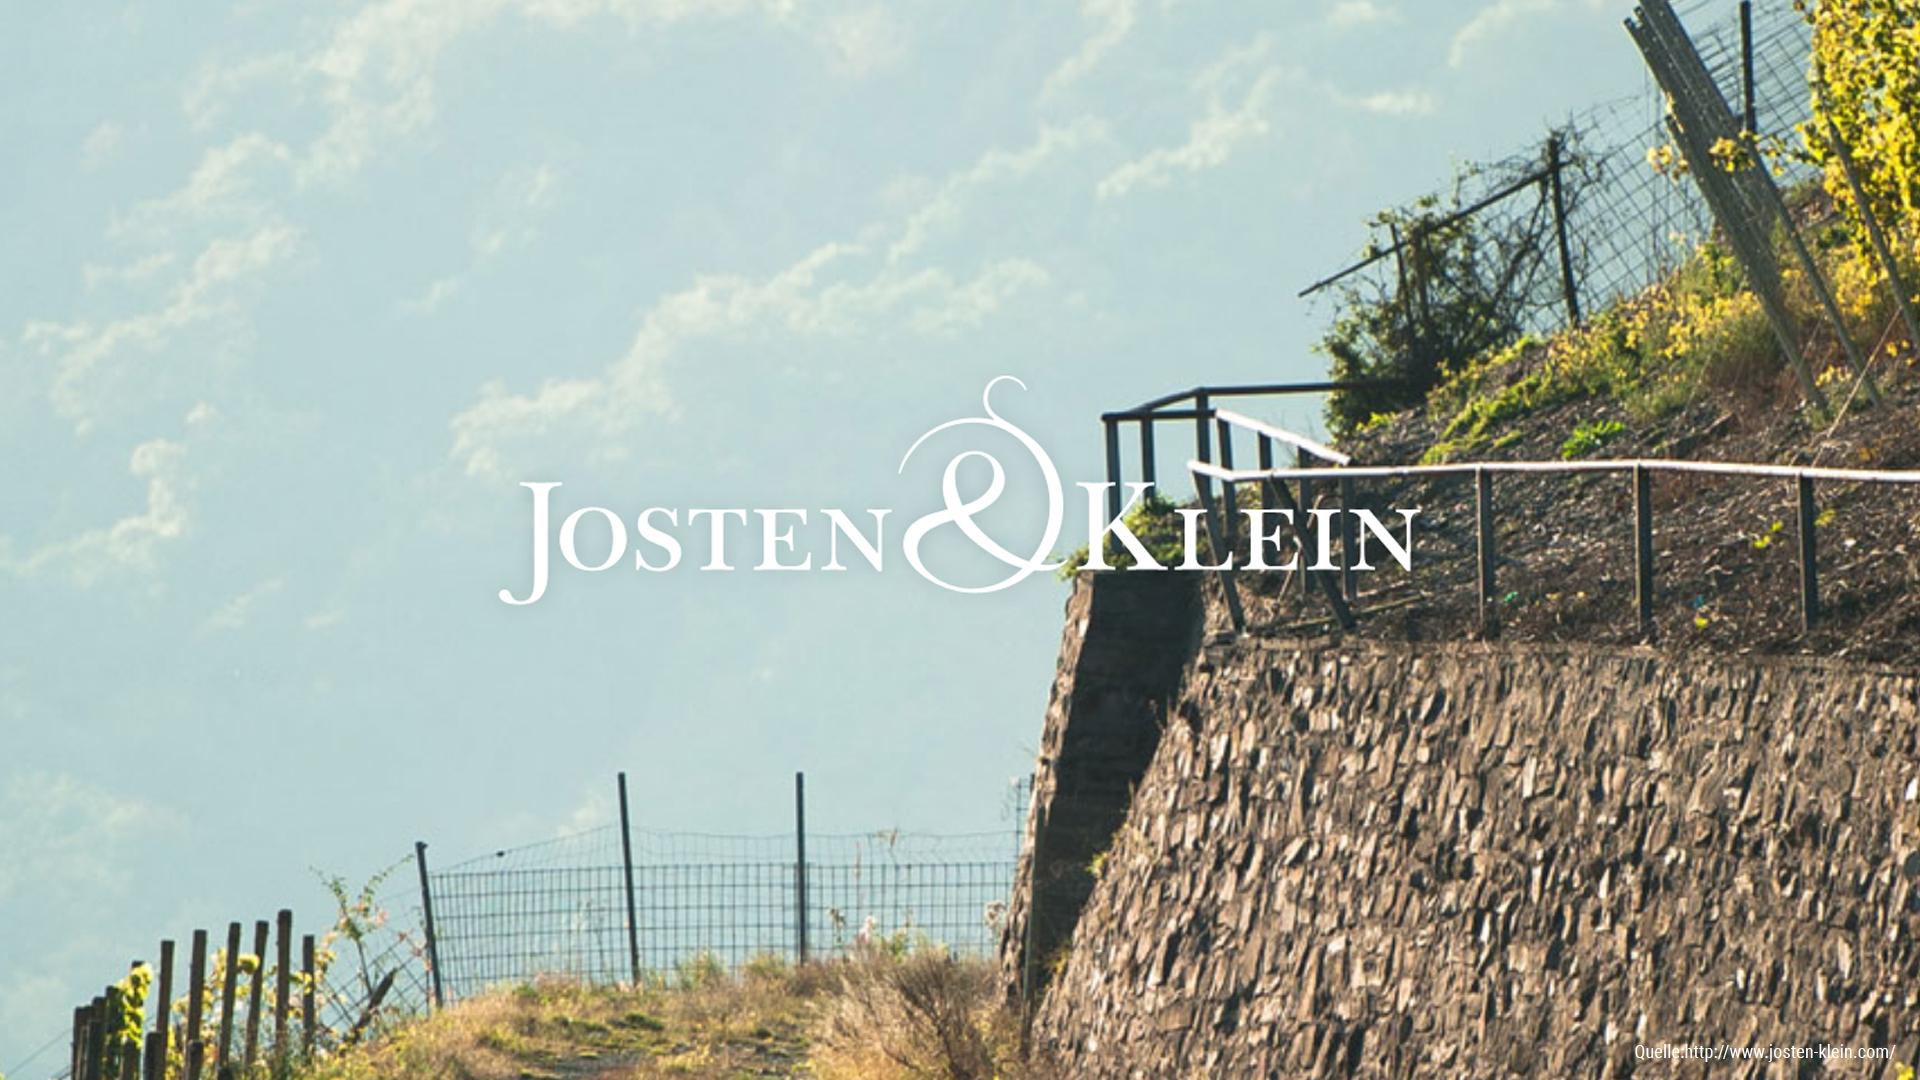 Marc Josten & Torsten Klein winery